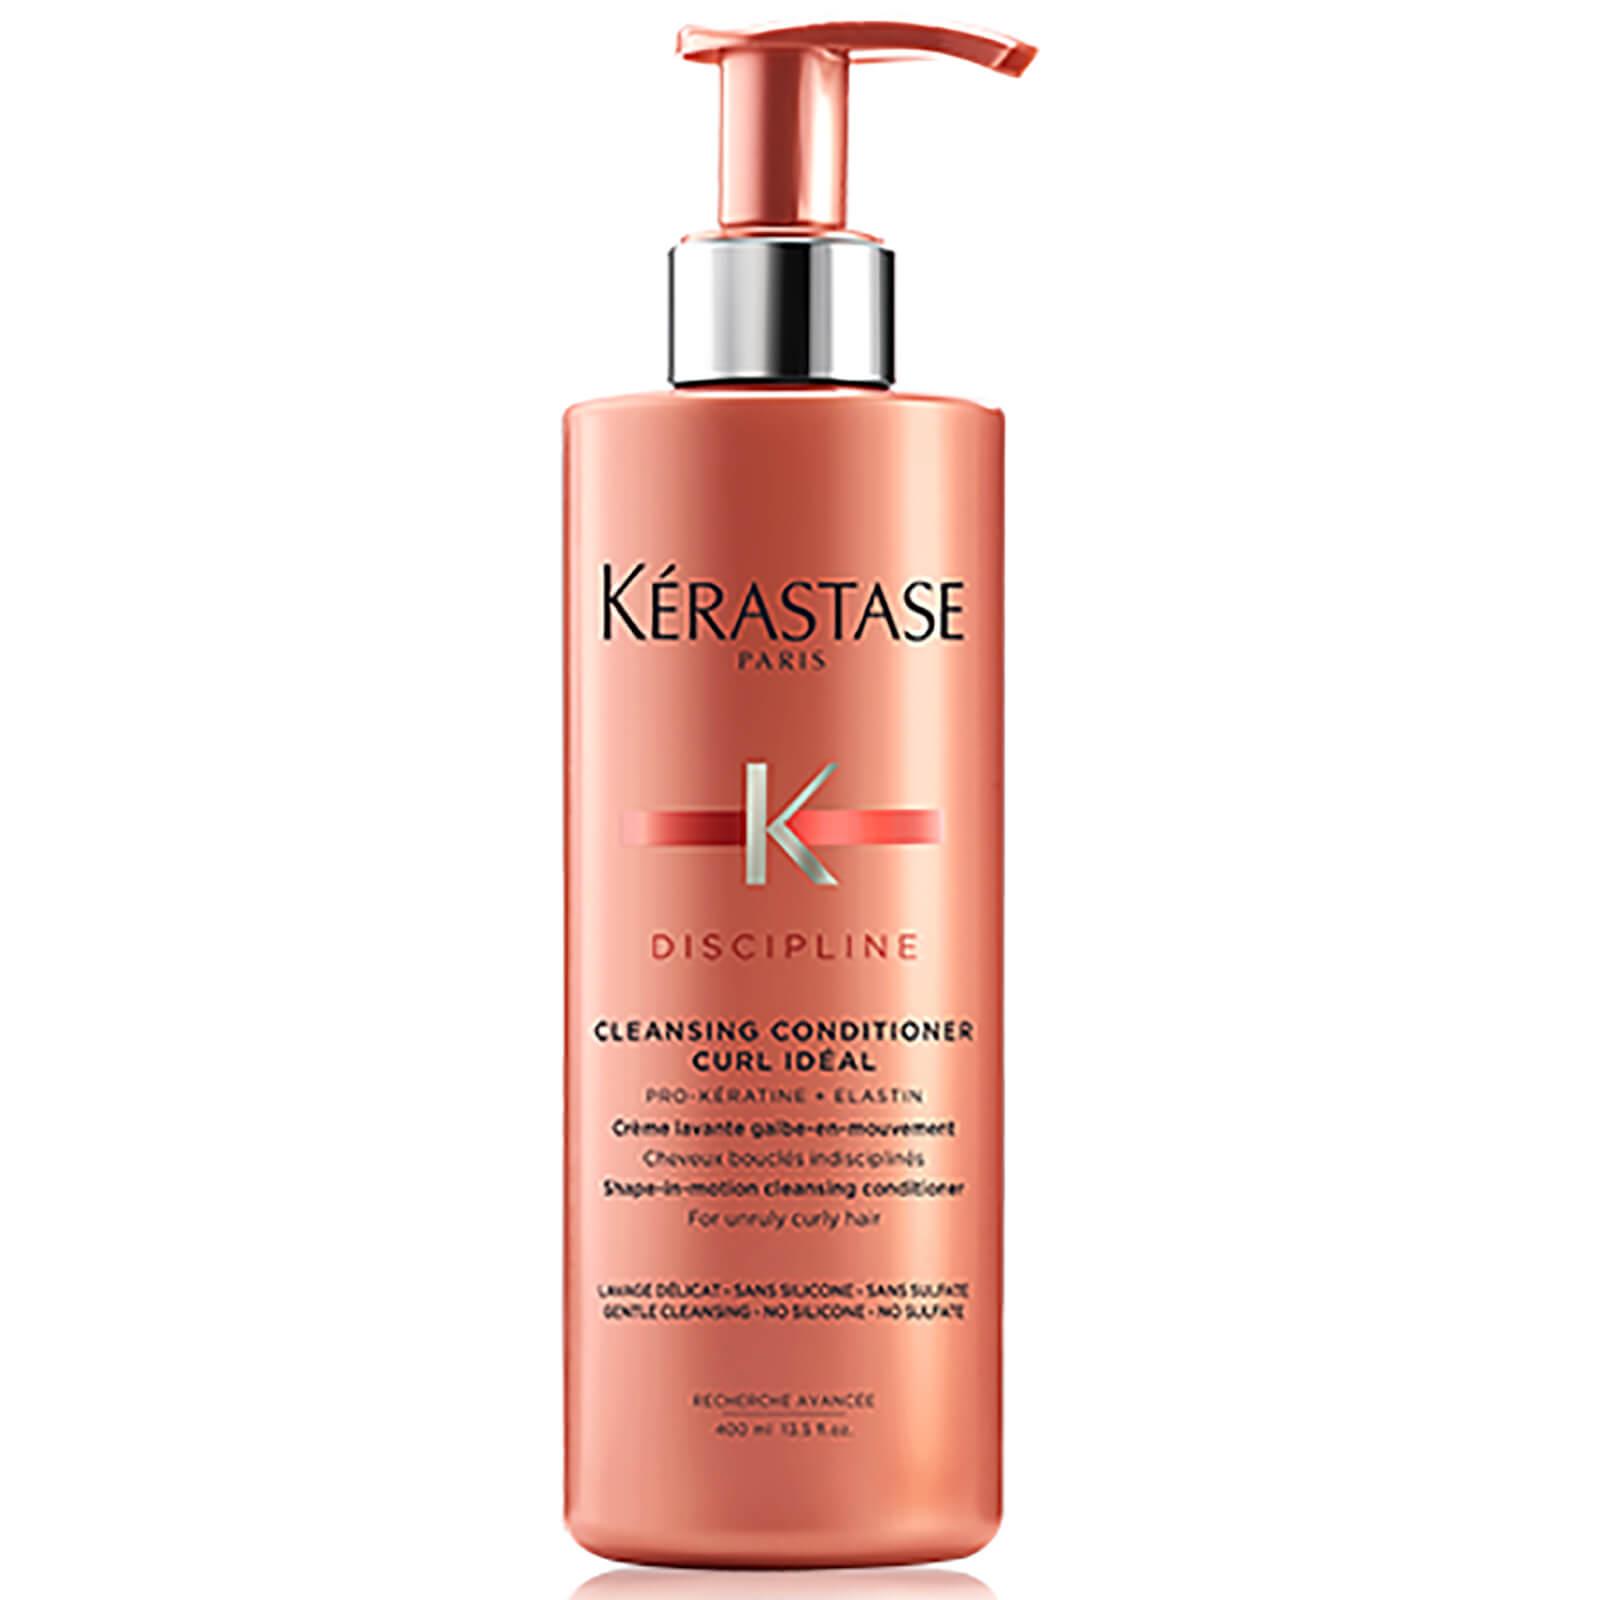 Kérastase Discipline Curl Ideal Cleansing Conditioner 400ml